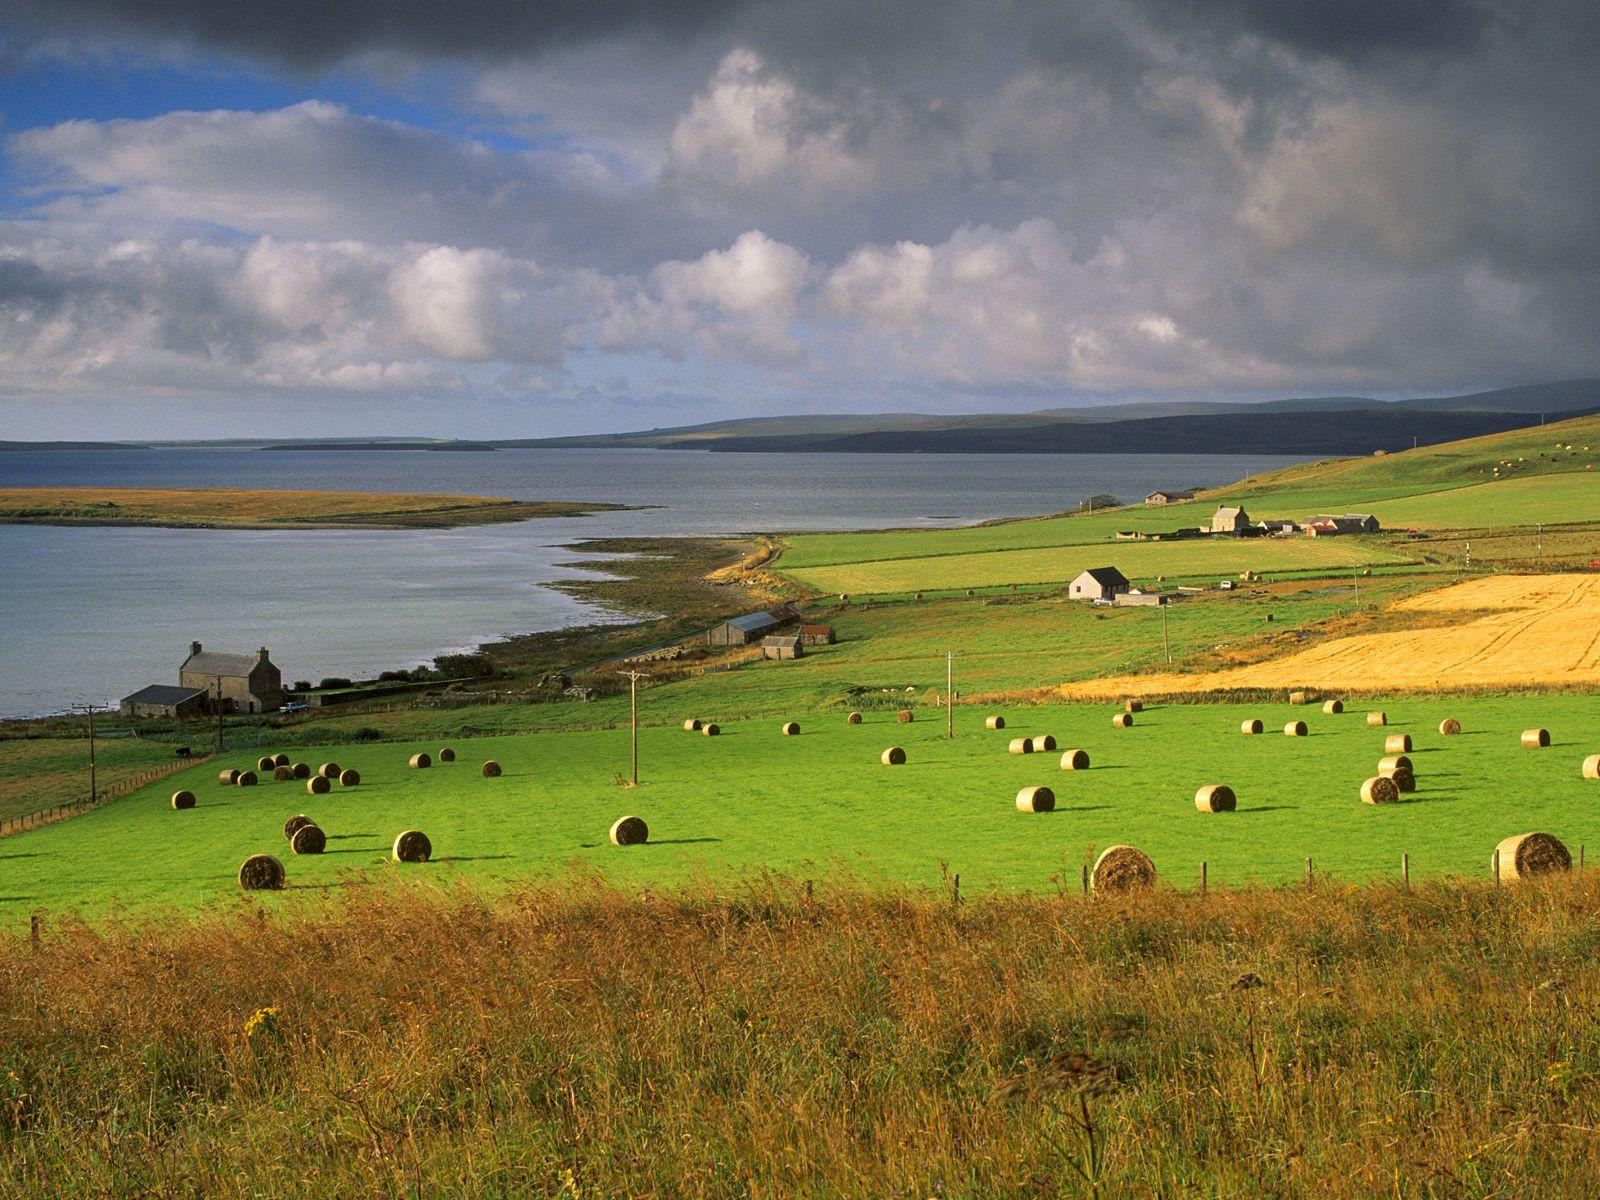 farmland at houton orkney islands scotland europe places i ve